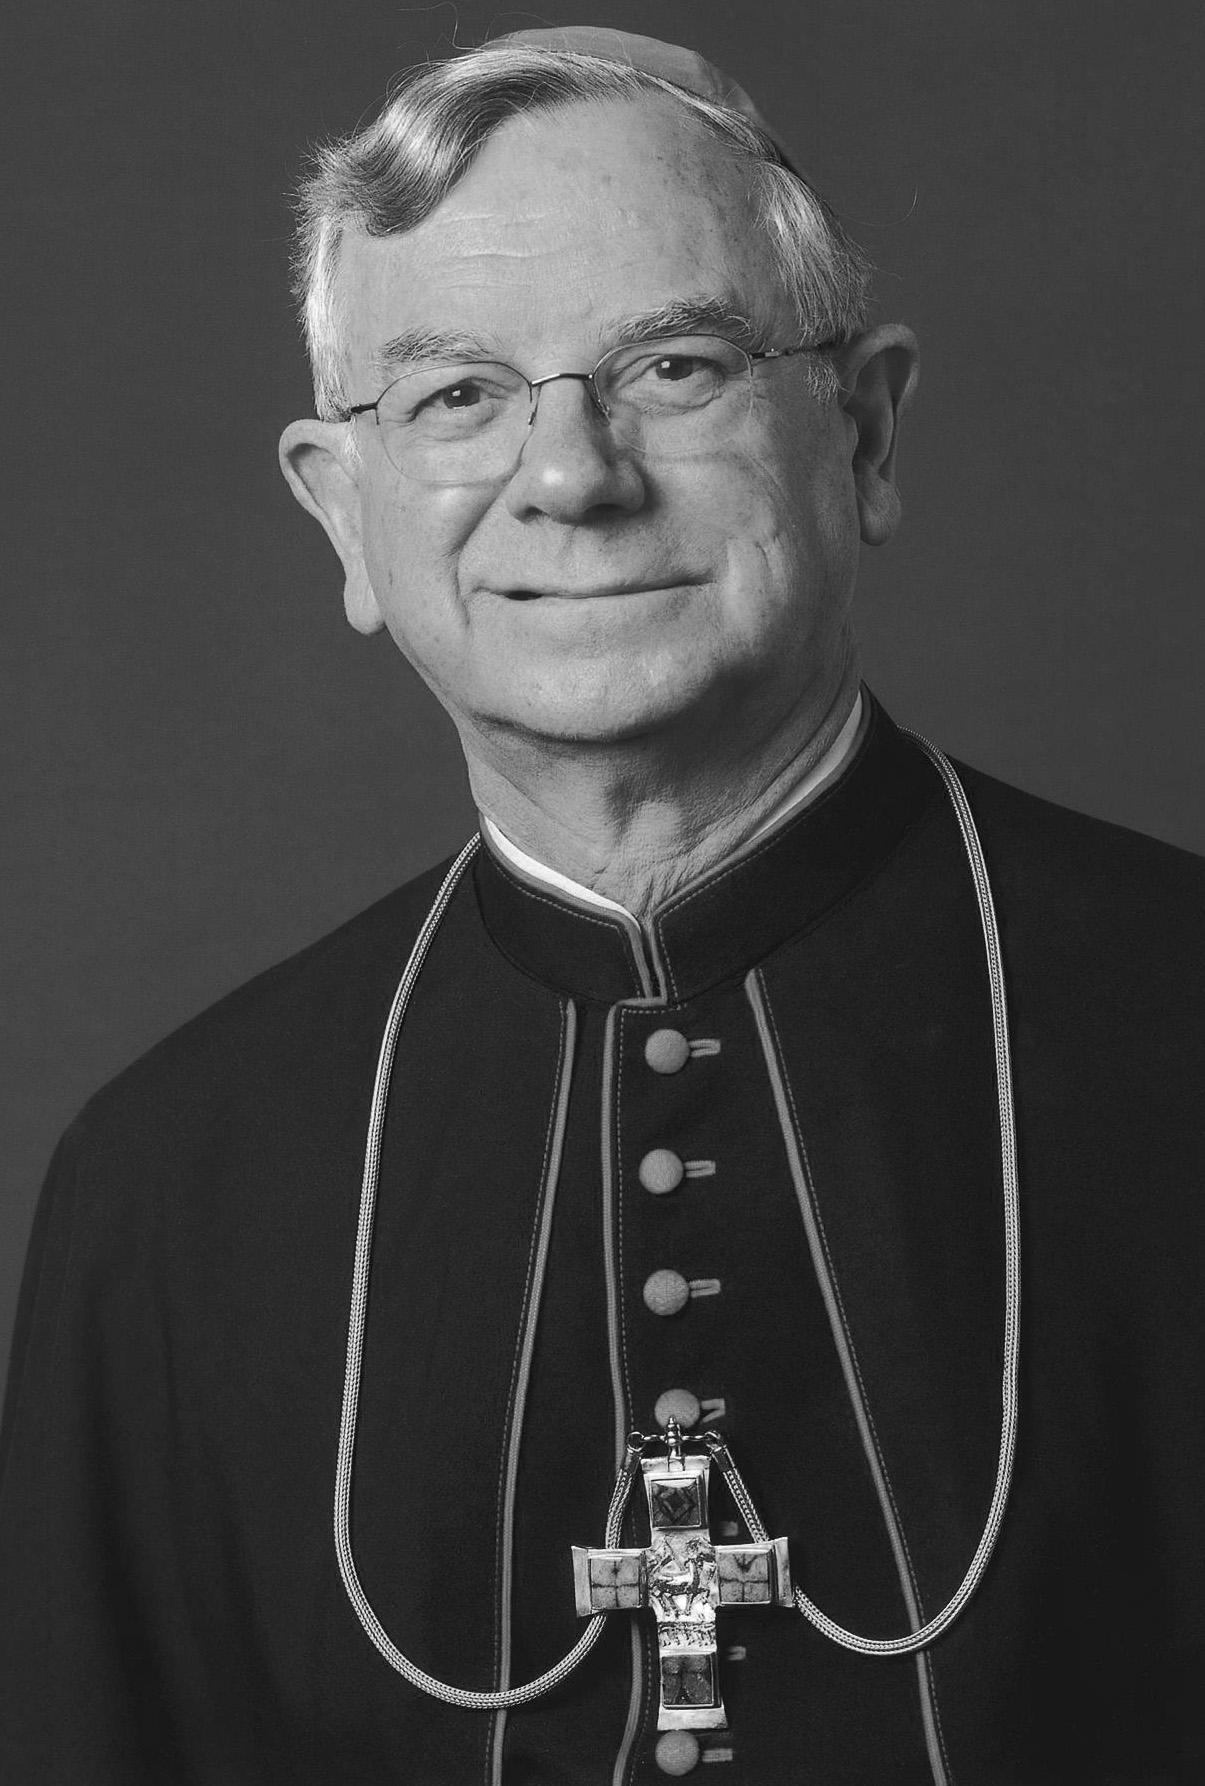 + Bischof em. Dr. Viktor Josef Dammertz. (Foto: Helmut Hien)